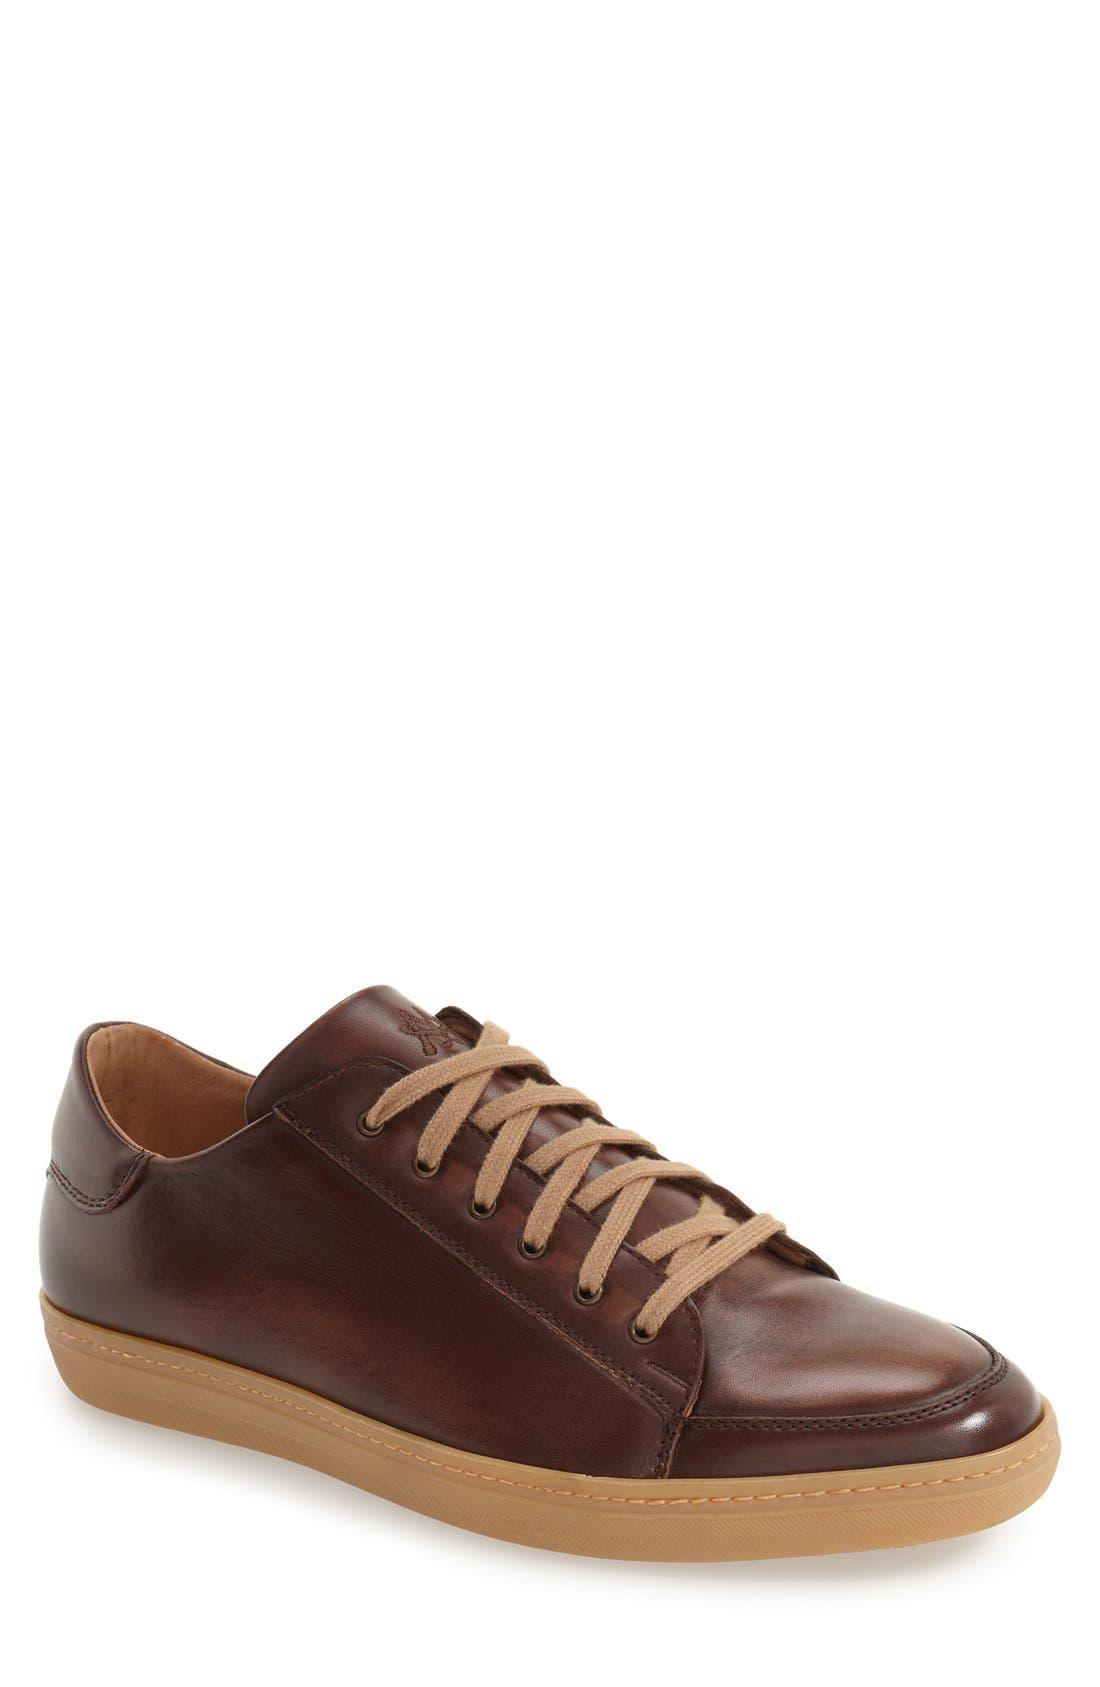 Main Image - Mezlan 'Masi' Lace-Up Sneaker (Men)